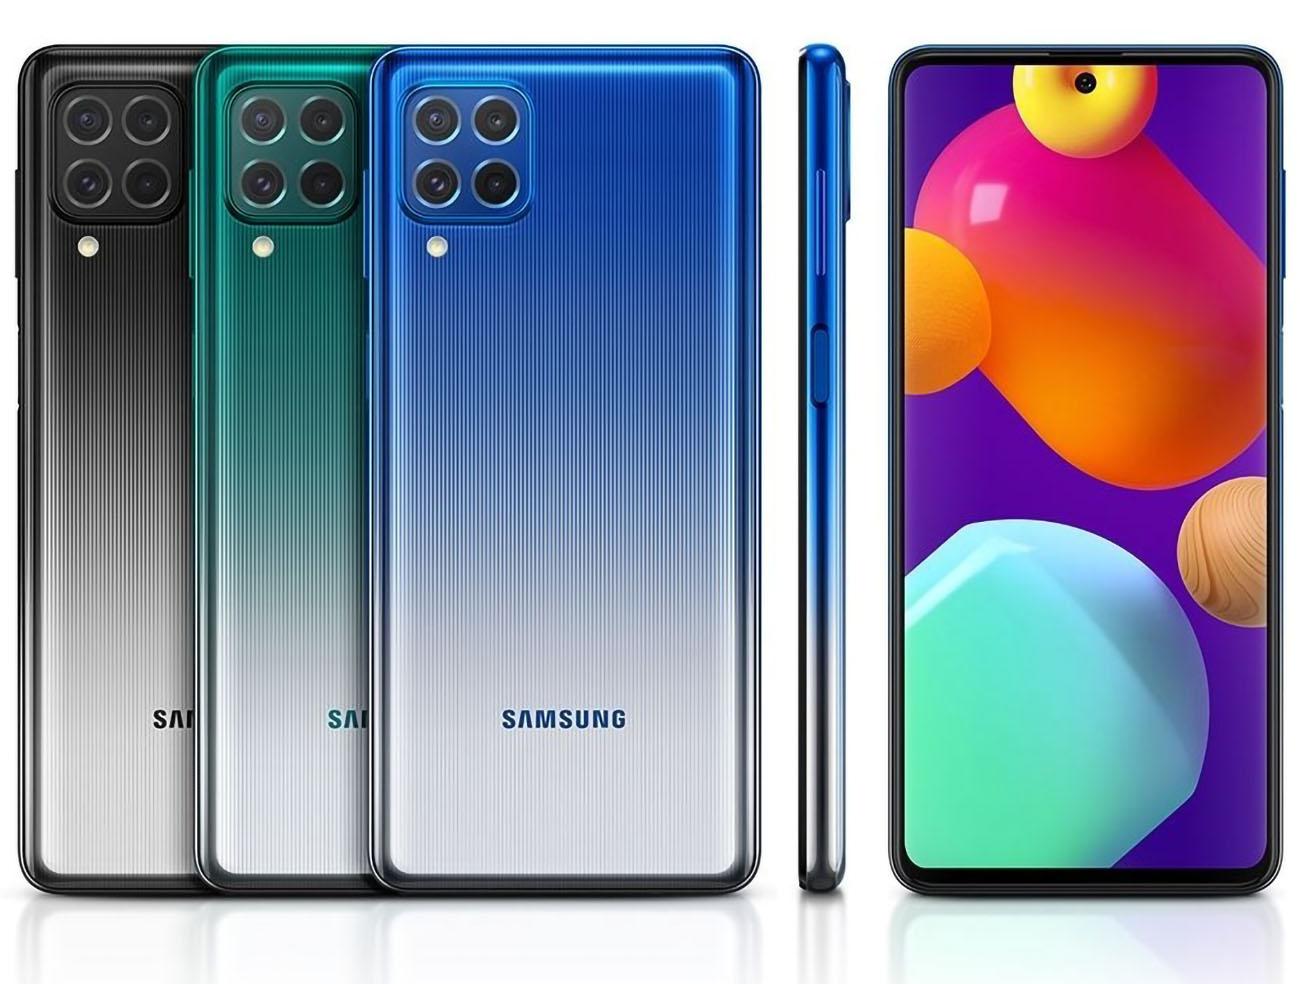 Samsung Galaxy F62 : le smartphone avec batterie de 7000 mAh sortira bien à l'international - Frandroid